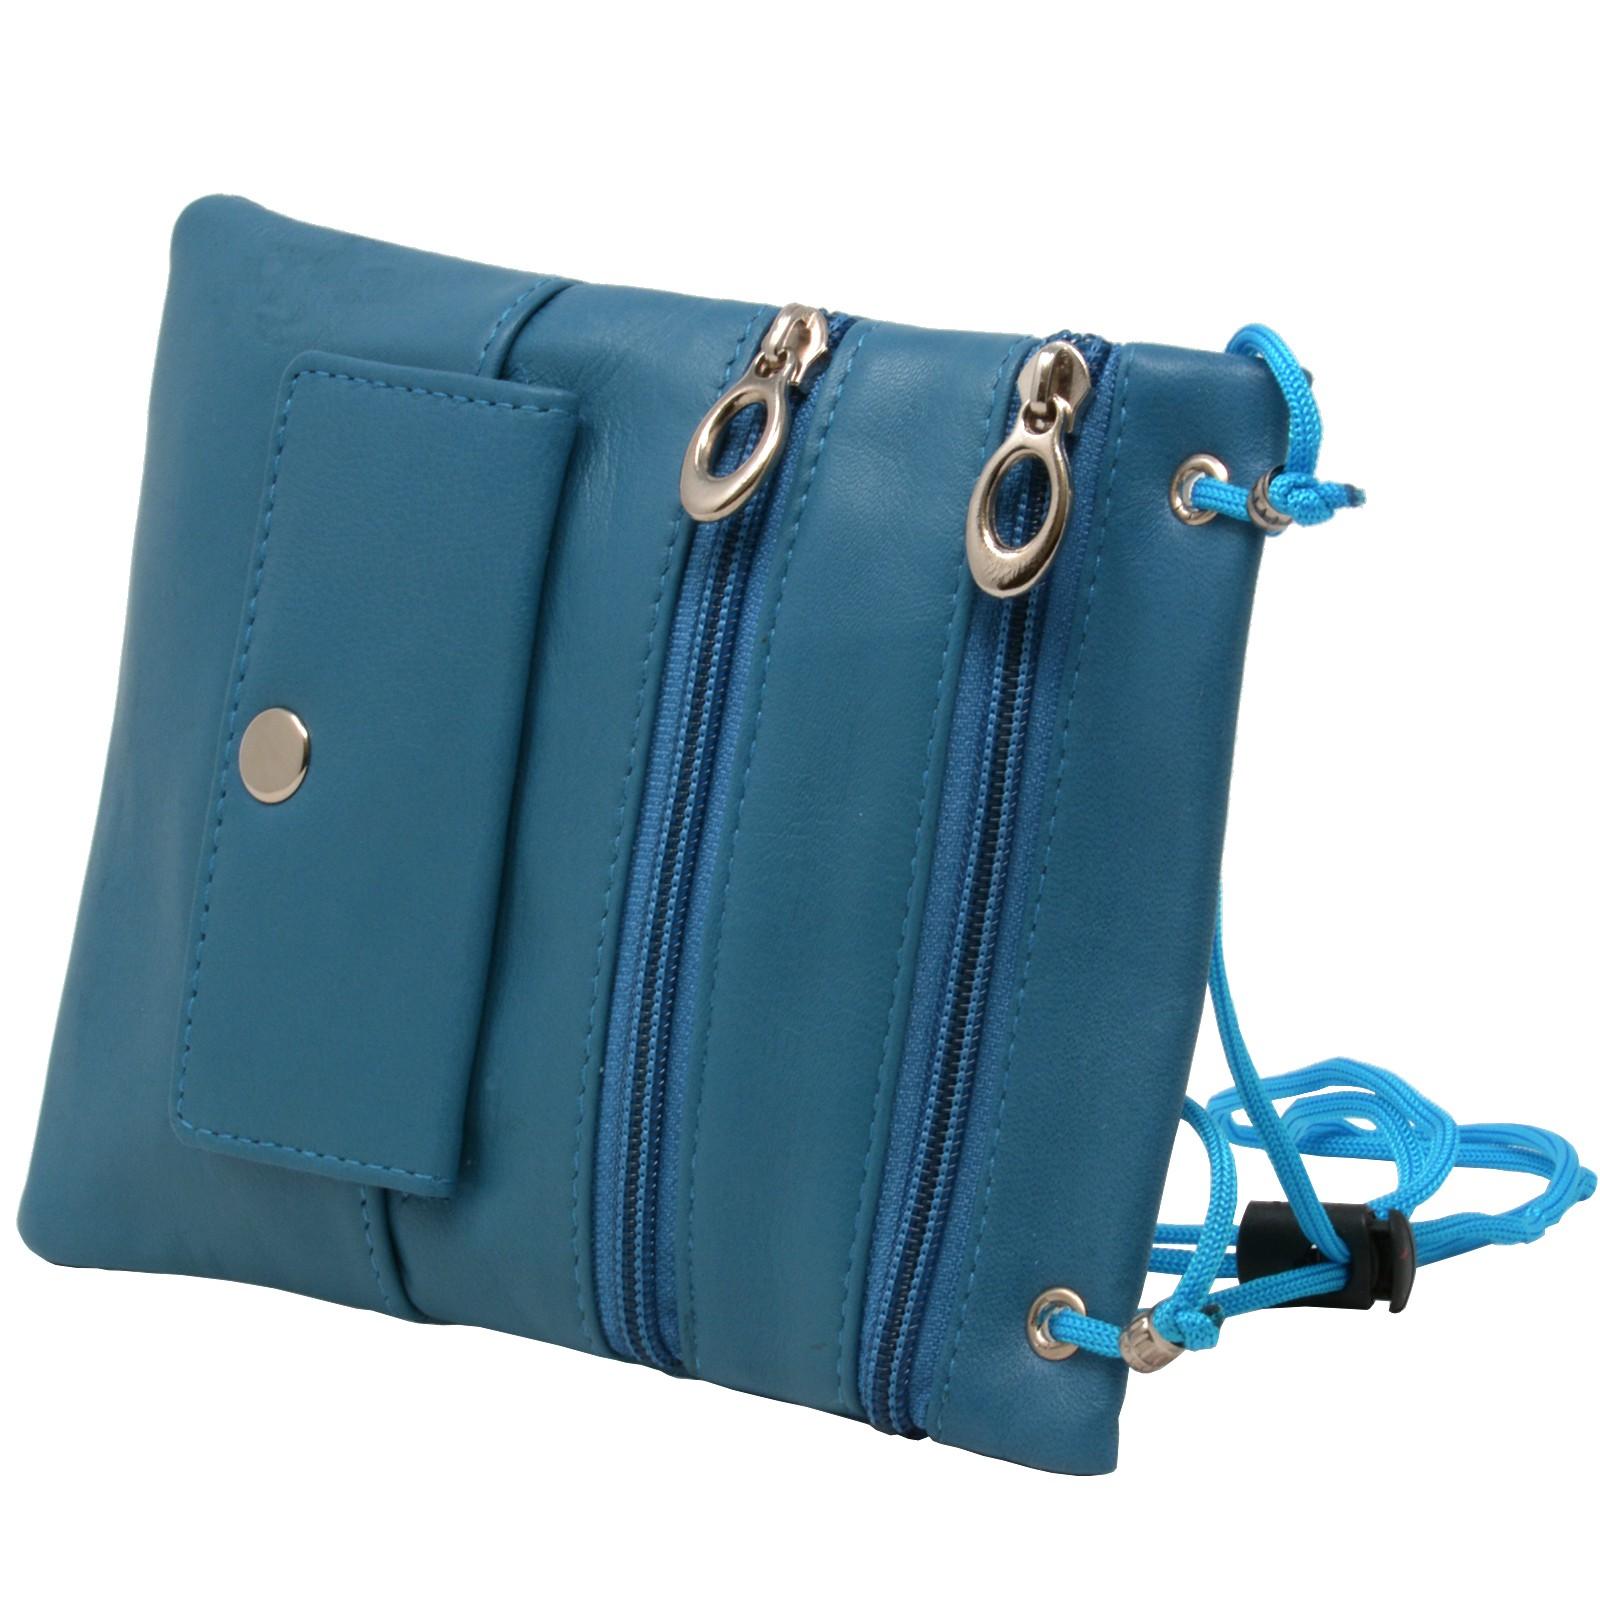 Soft-Leather-Purse-Organizer-Shoulder-Bag-4-Pocket-Micro-Handbag-Travel-Wallet thumbnail 24